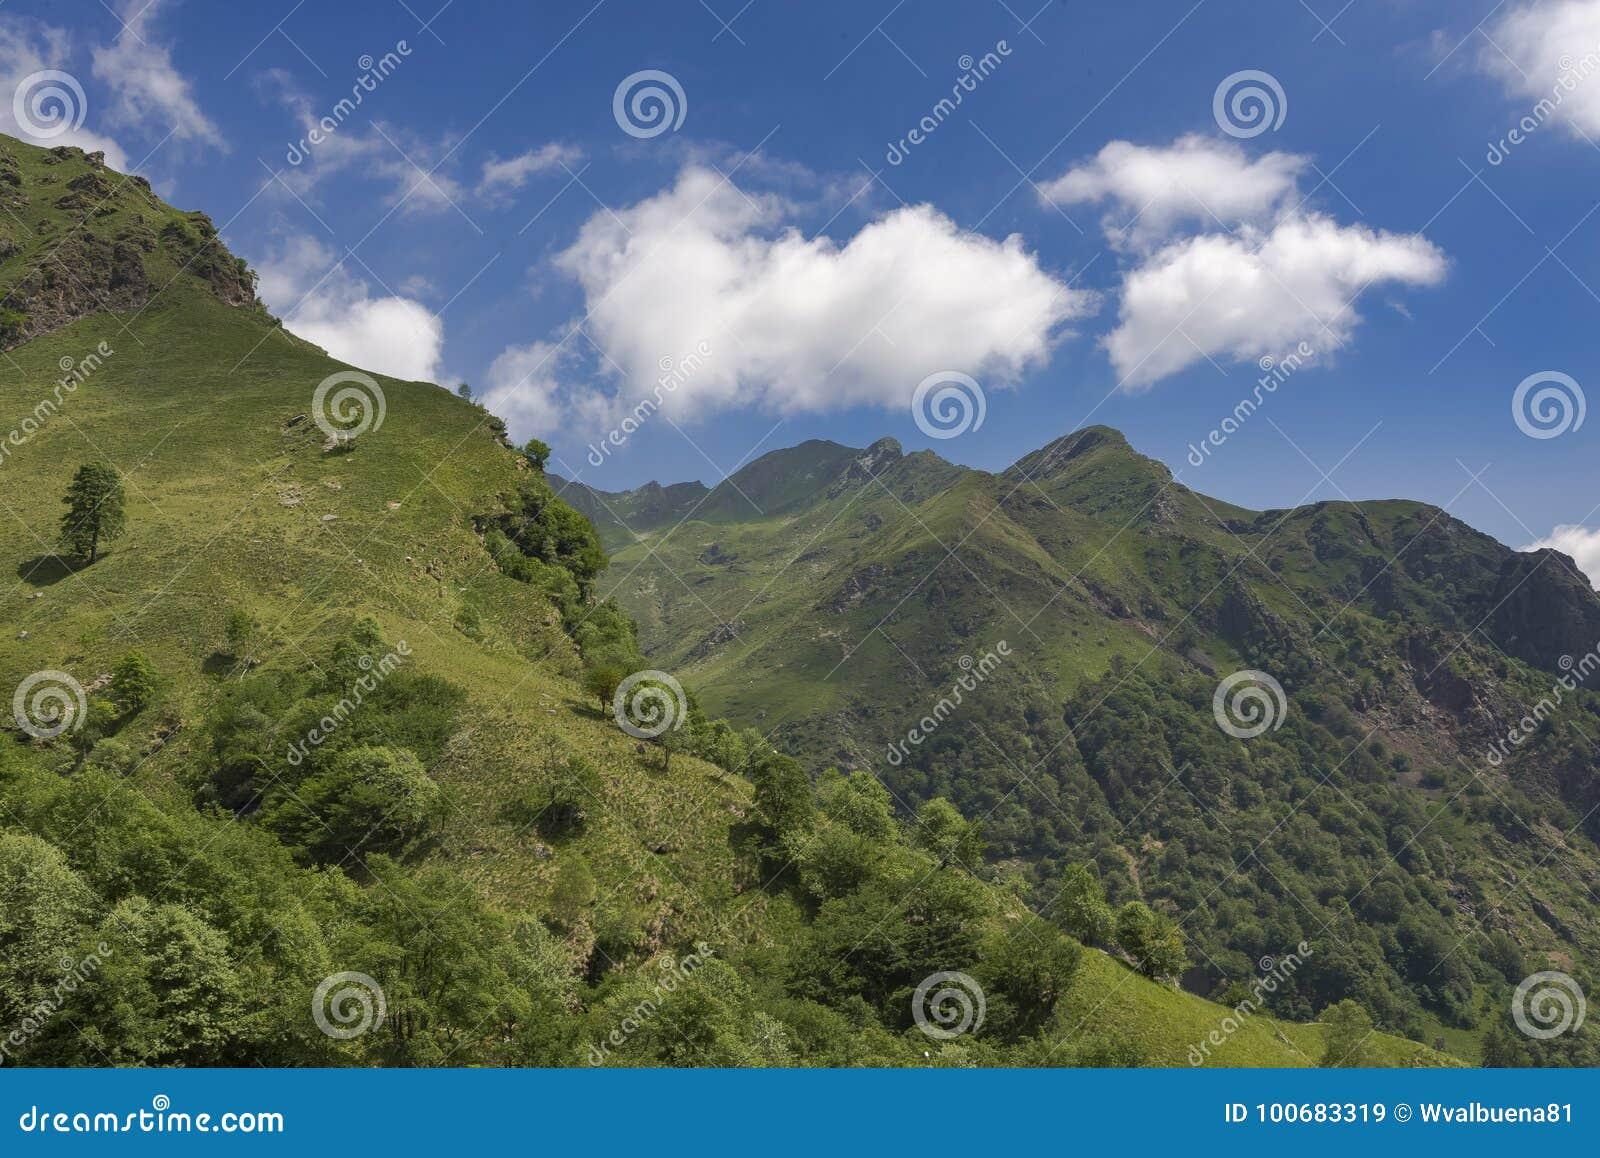 Valle italiana delle alpi-Valstrona